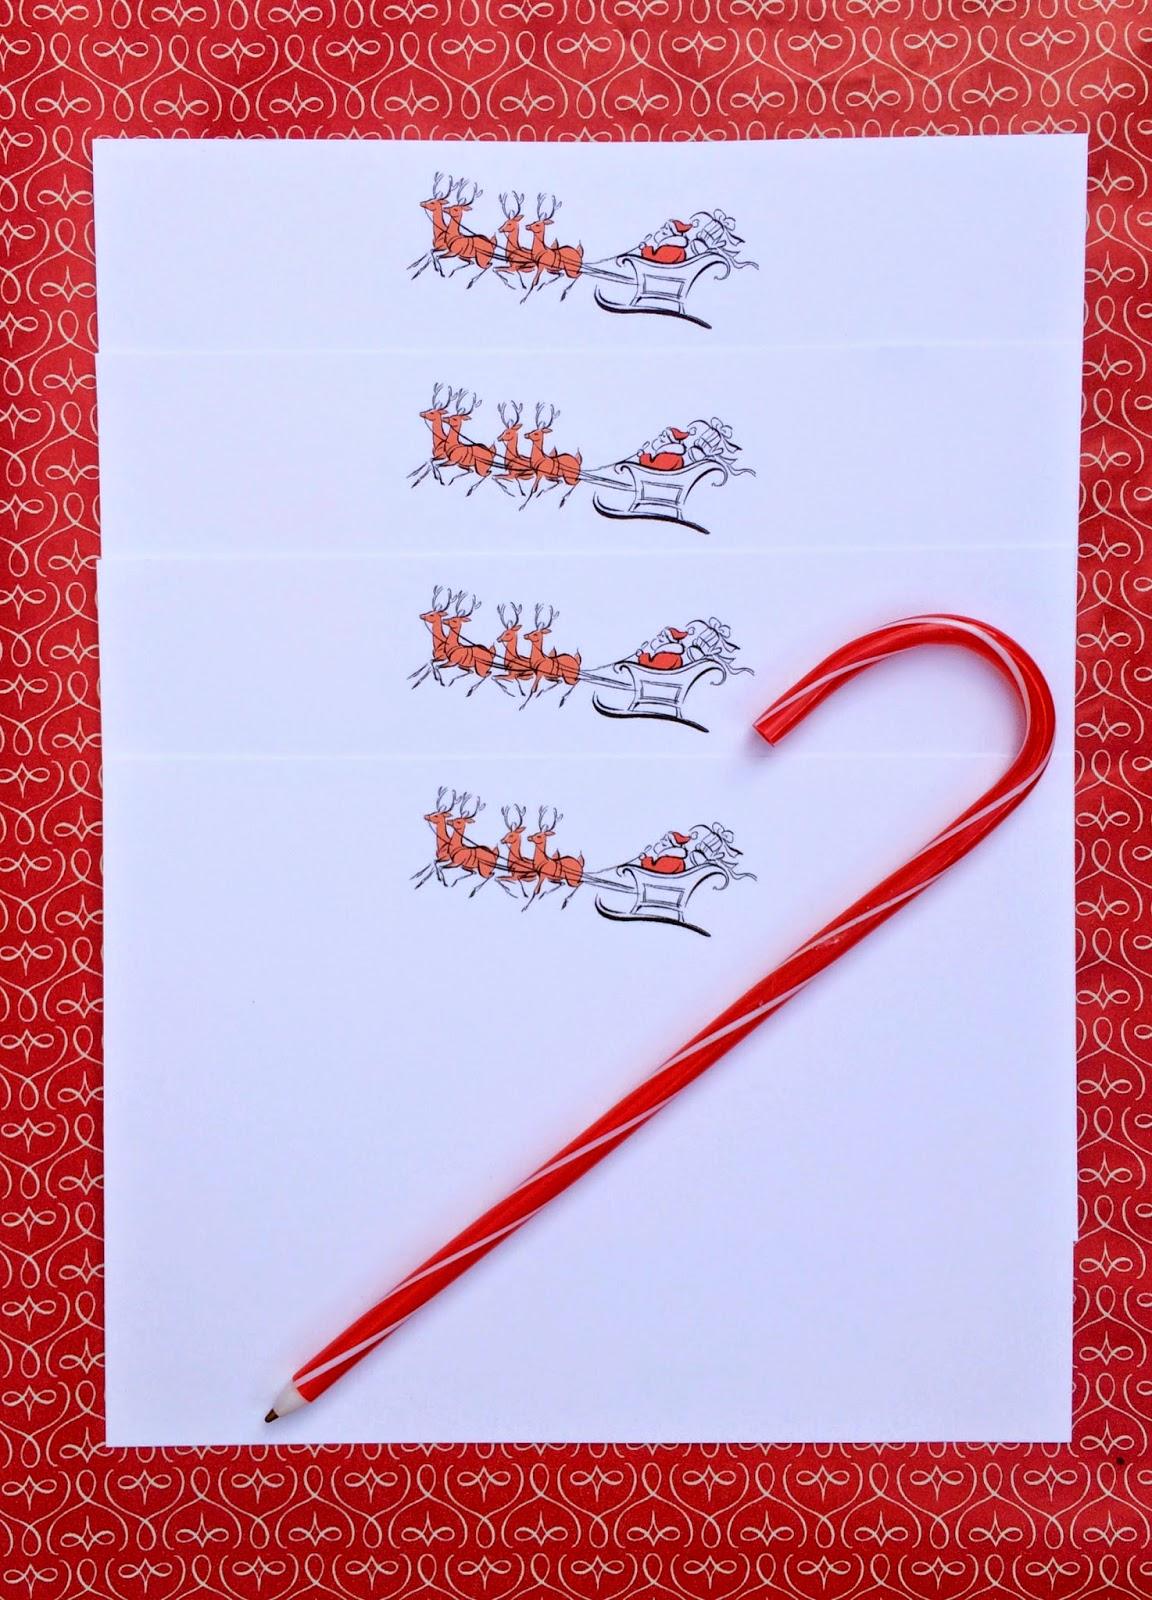 jac o lyn murphy make a wish and believe printable santa